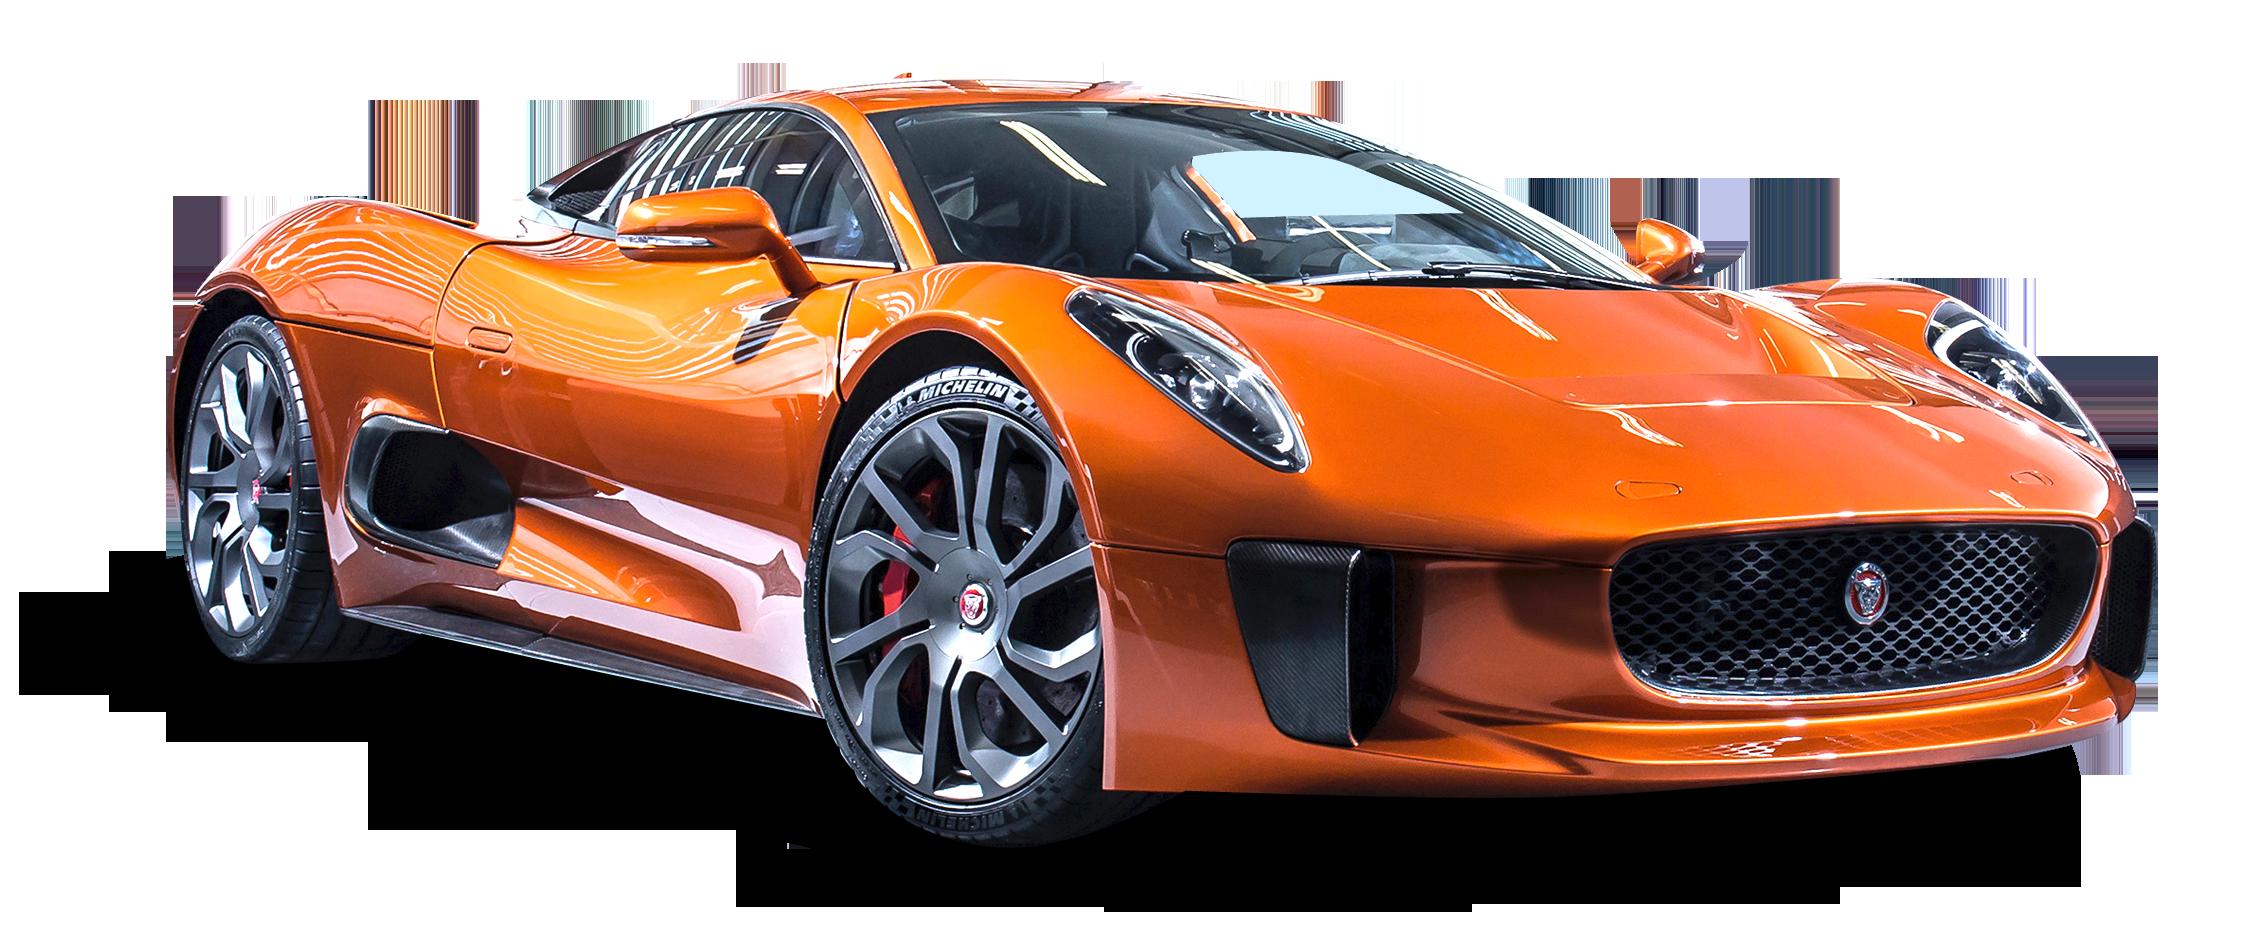 Jaguar C X75 James Bond Orange Car Png Image Jaguar Car Orange Car Jaguar